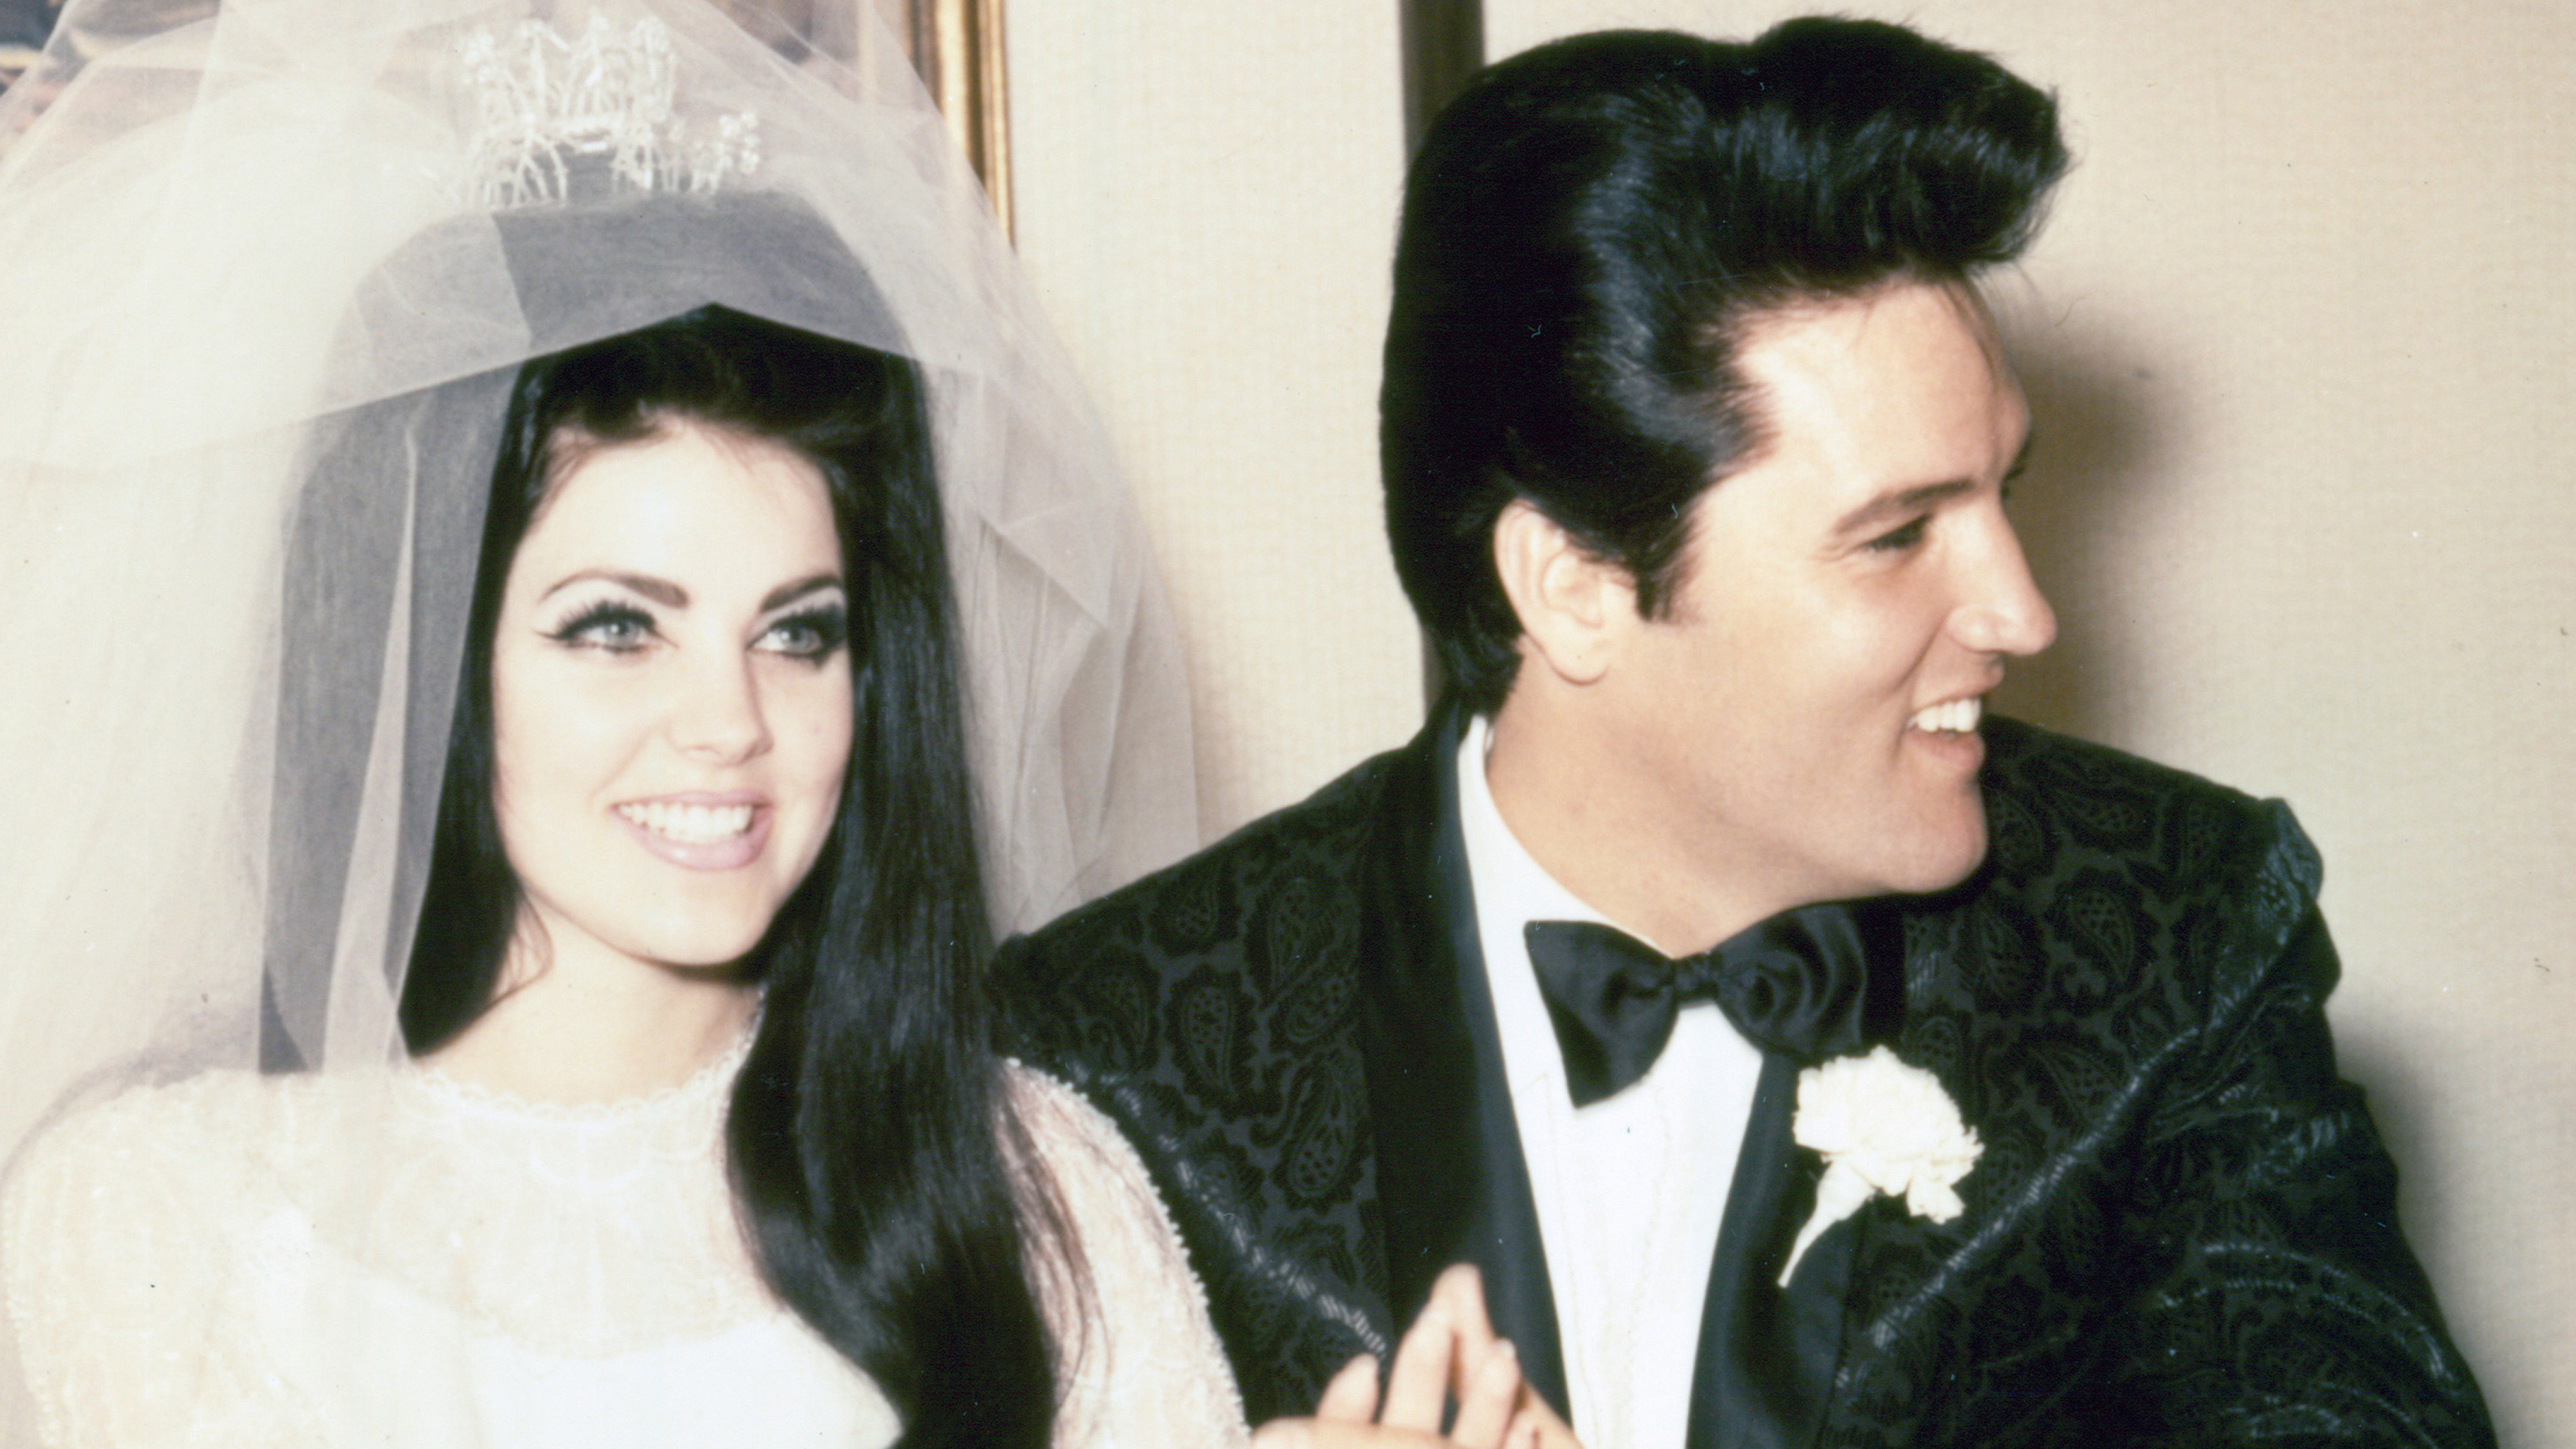 Priscilla Presley Talks Dating And Marrying Husband Elvis Presley